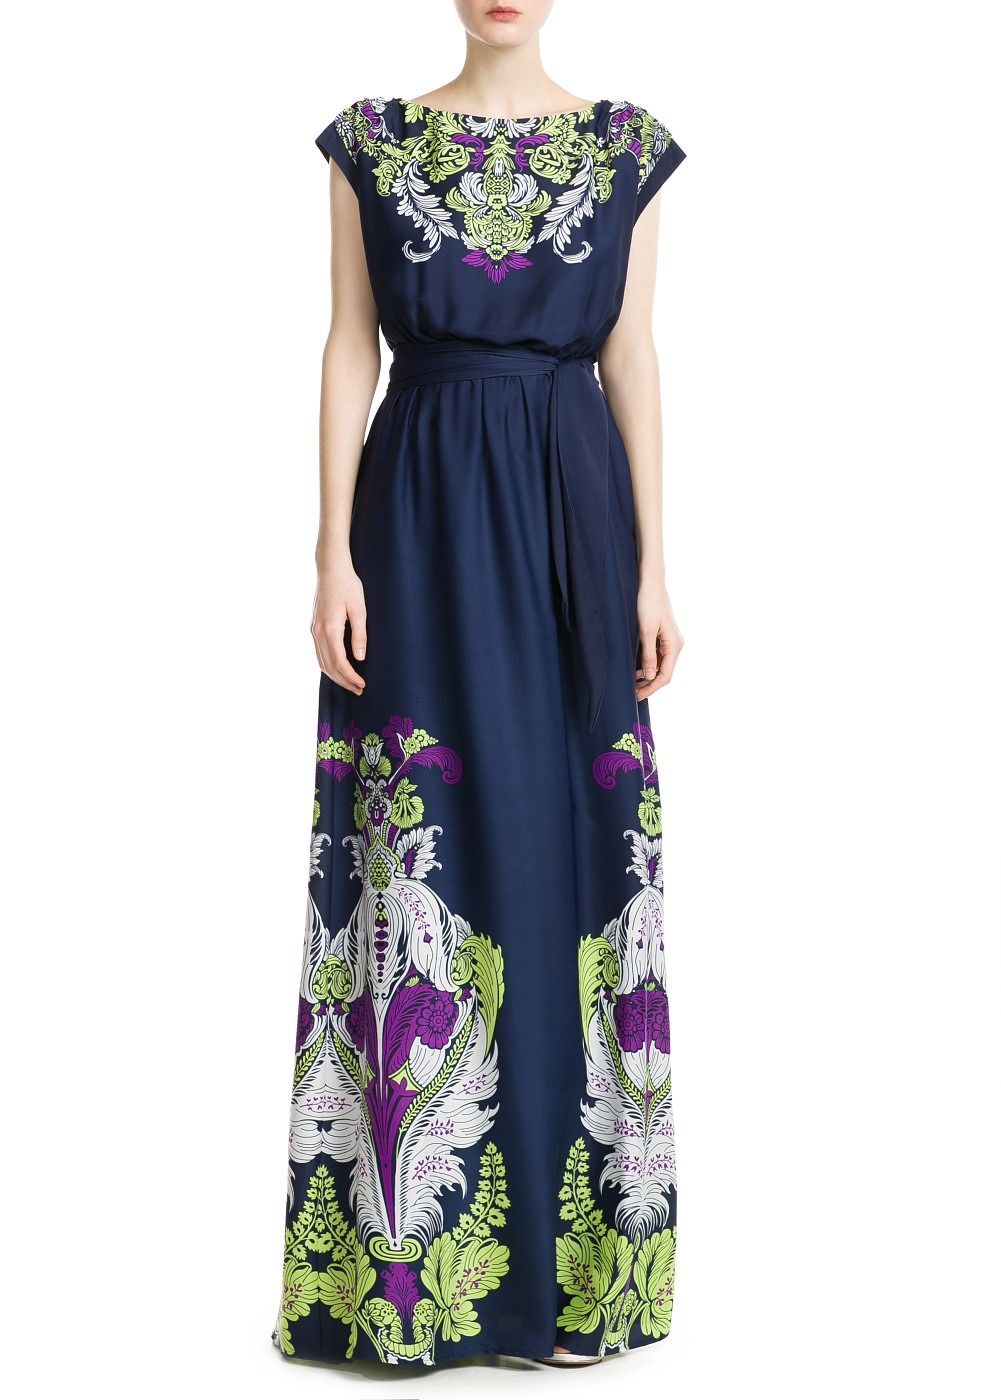 Kleid mit barockmuster - Damen | Dresses, Print dress ...